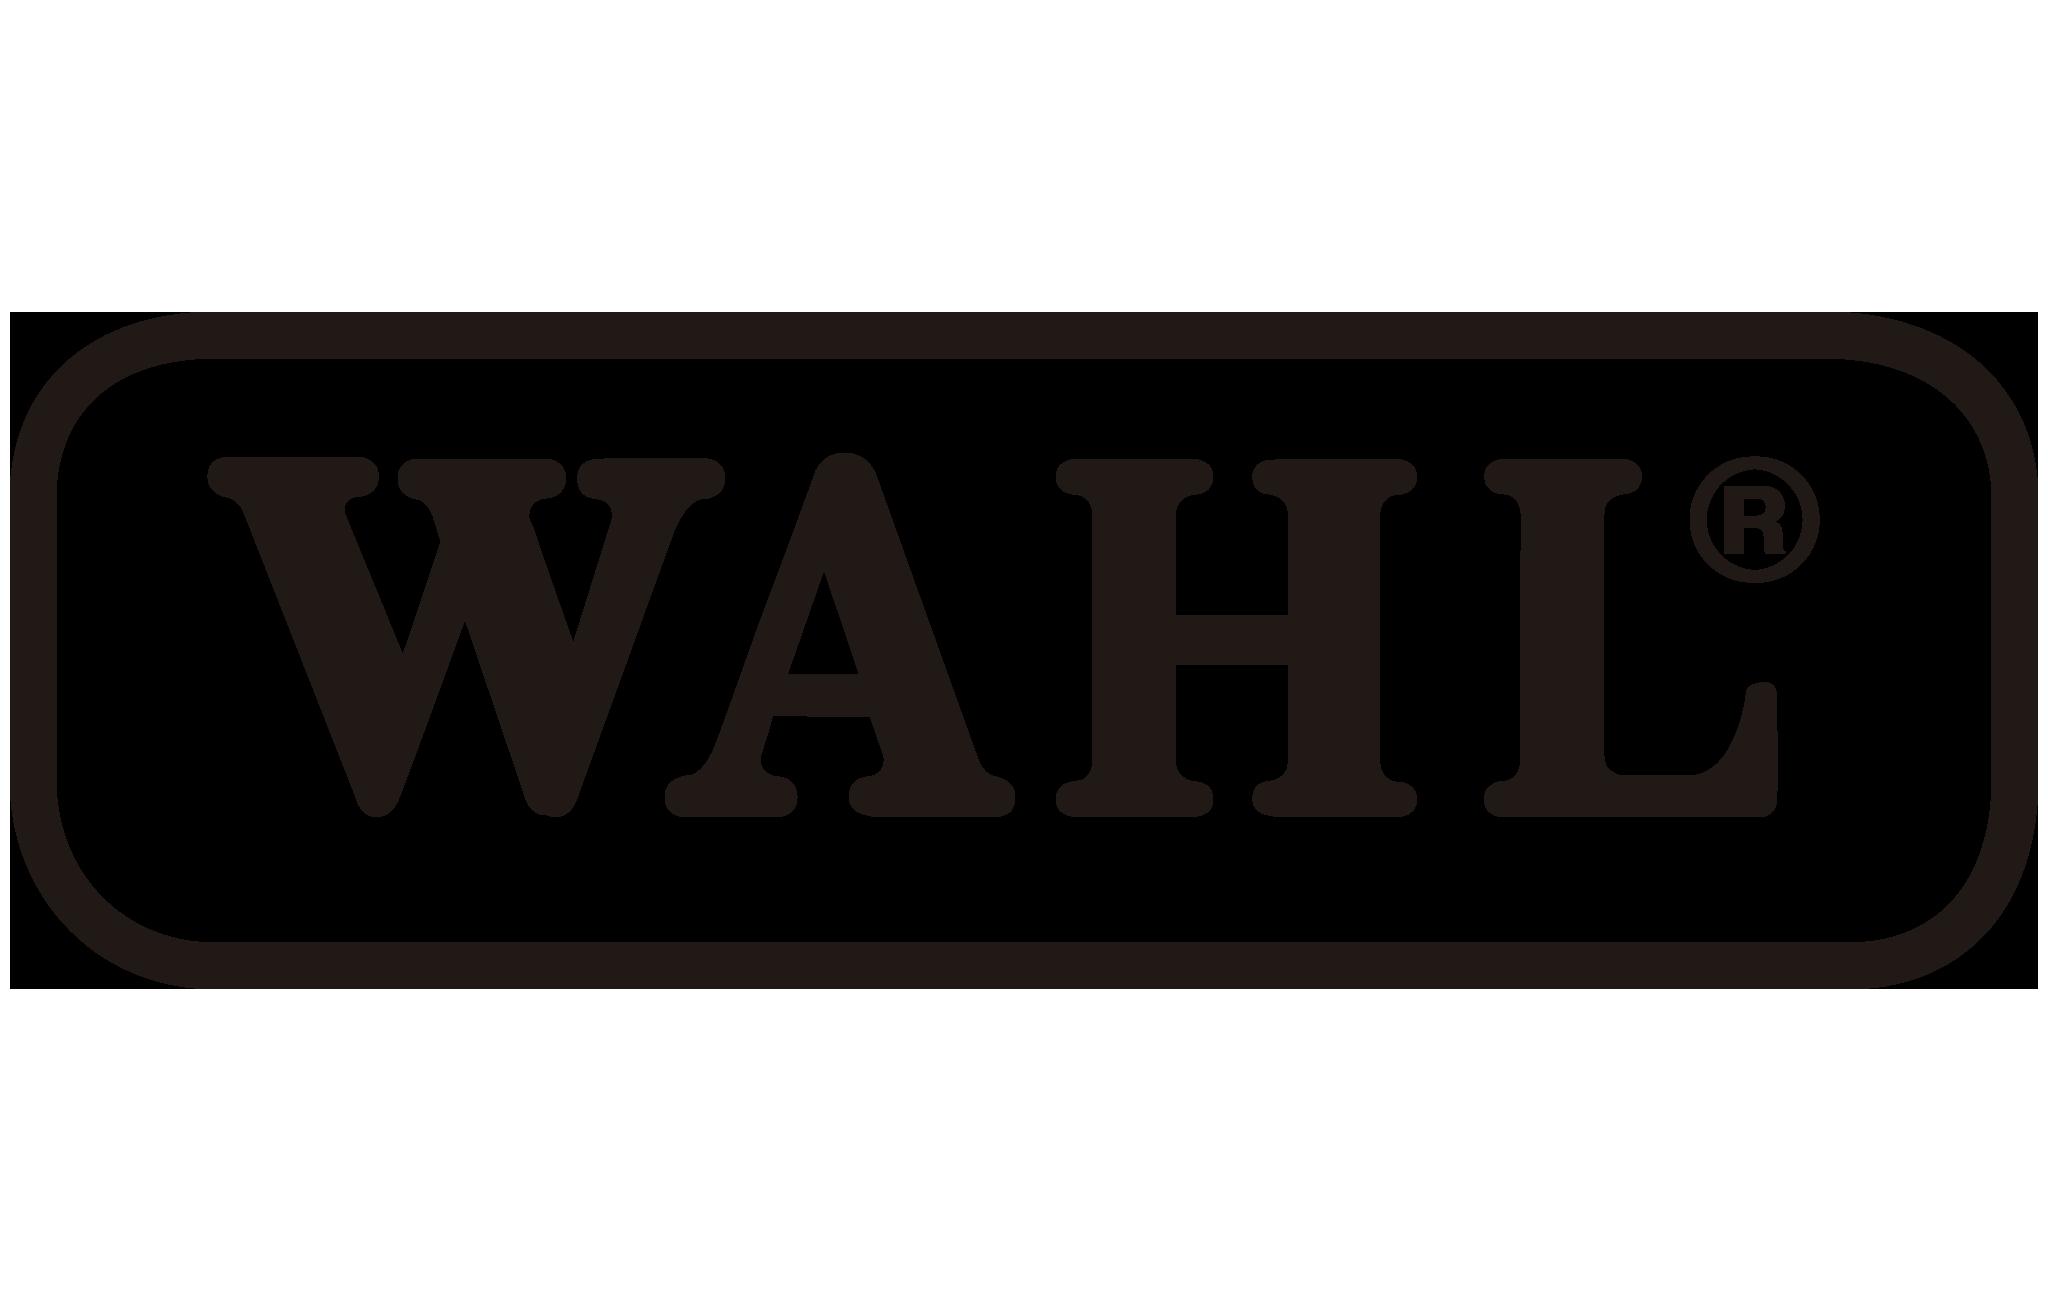 Wahl logo